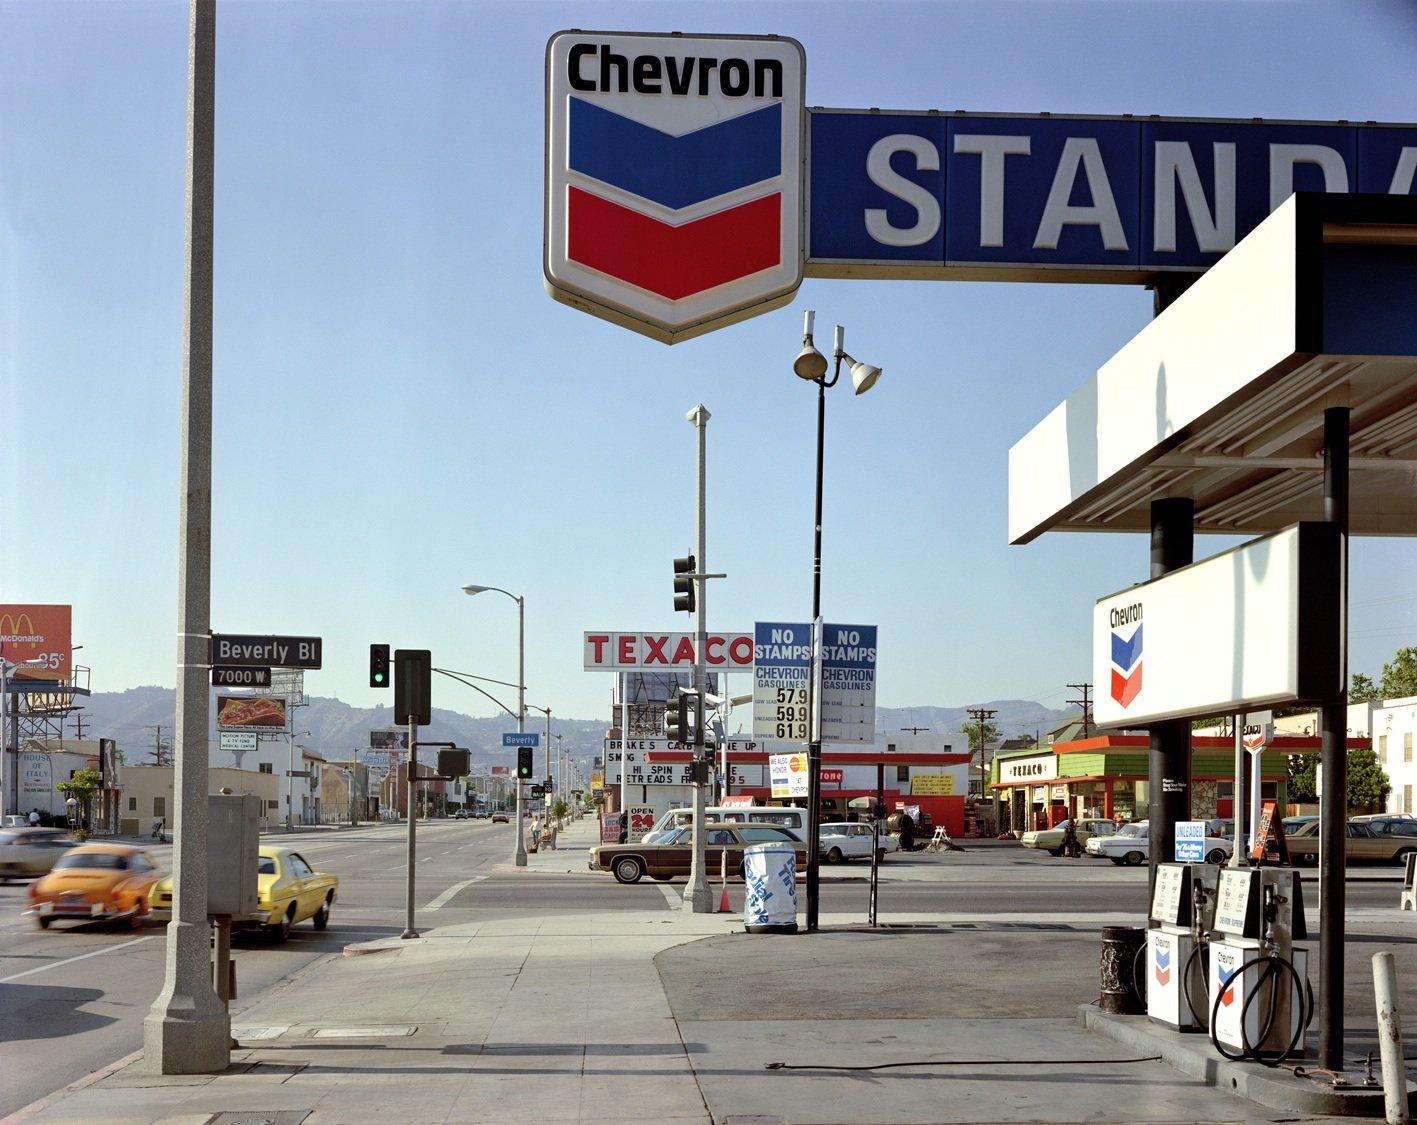 Beverly Boulevard and La Brea Avenue, Los Angeles, California, June 21, 1975 Stephen Shore